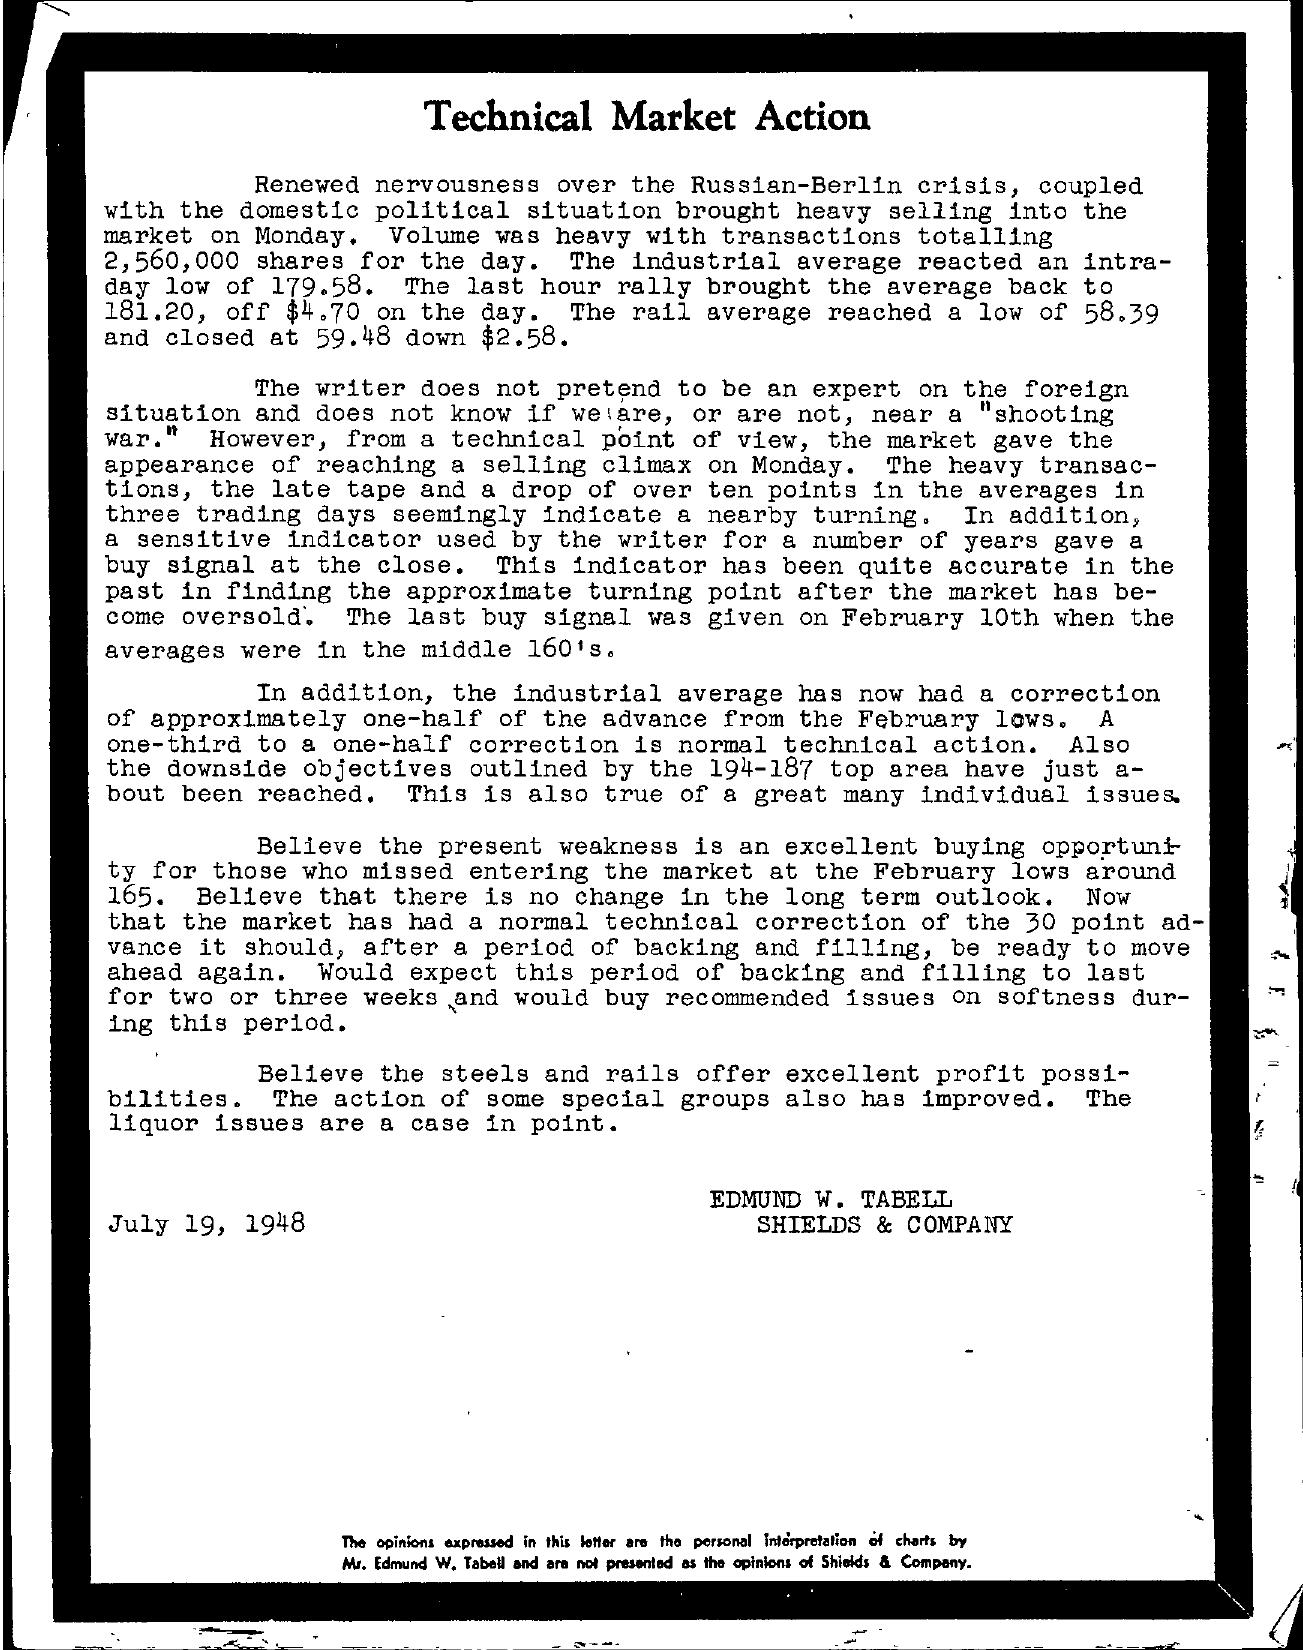 Tabell's Market Letter - July 19, 1948